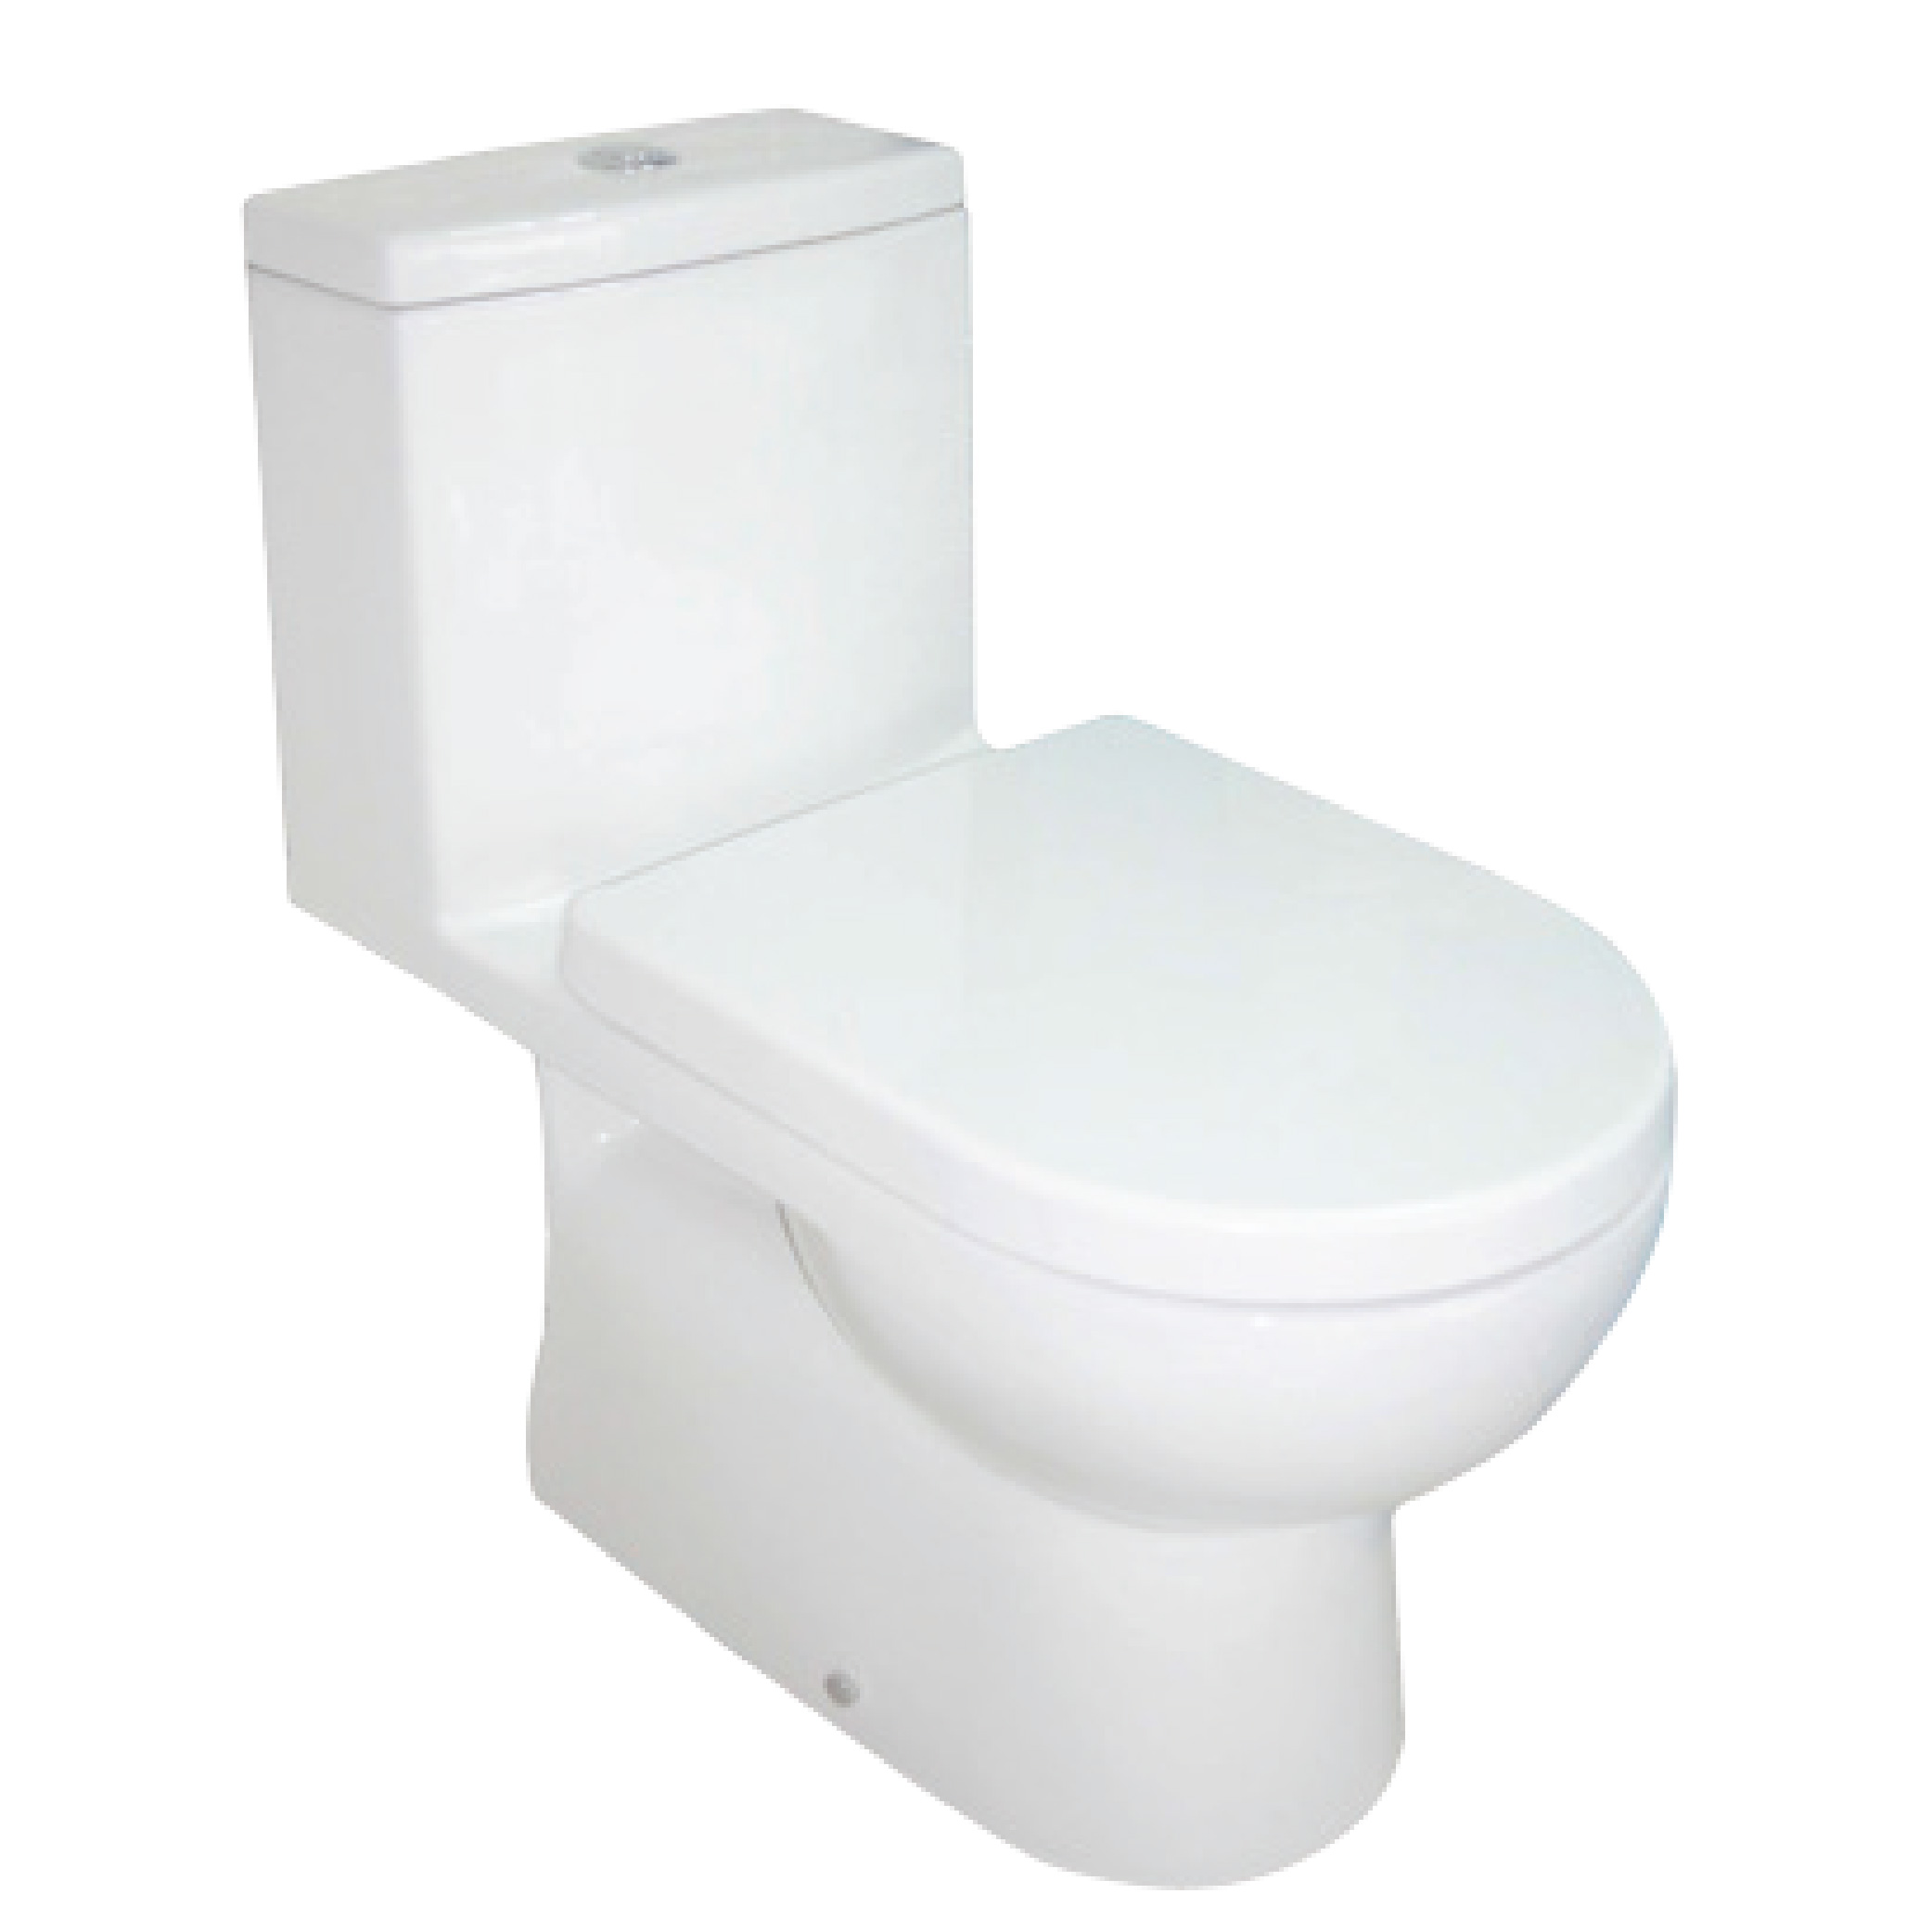 BỒN CẦU CARANO 1 KHỐI MC1655 ( Toilet model: MC1655 )